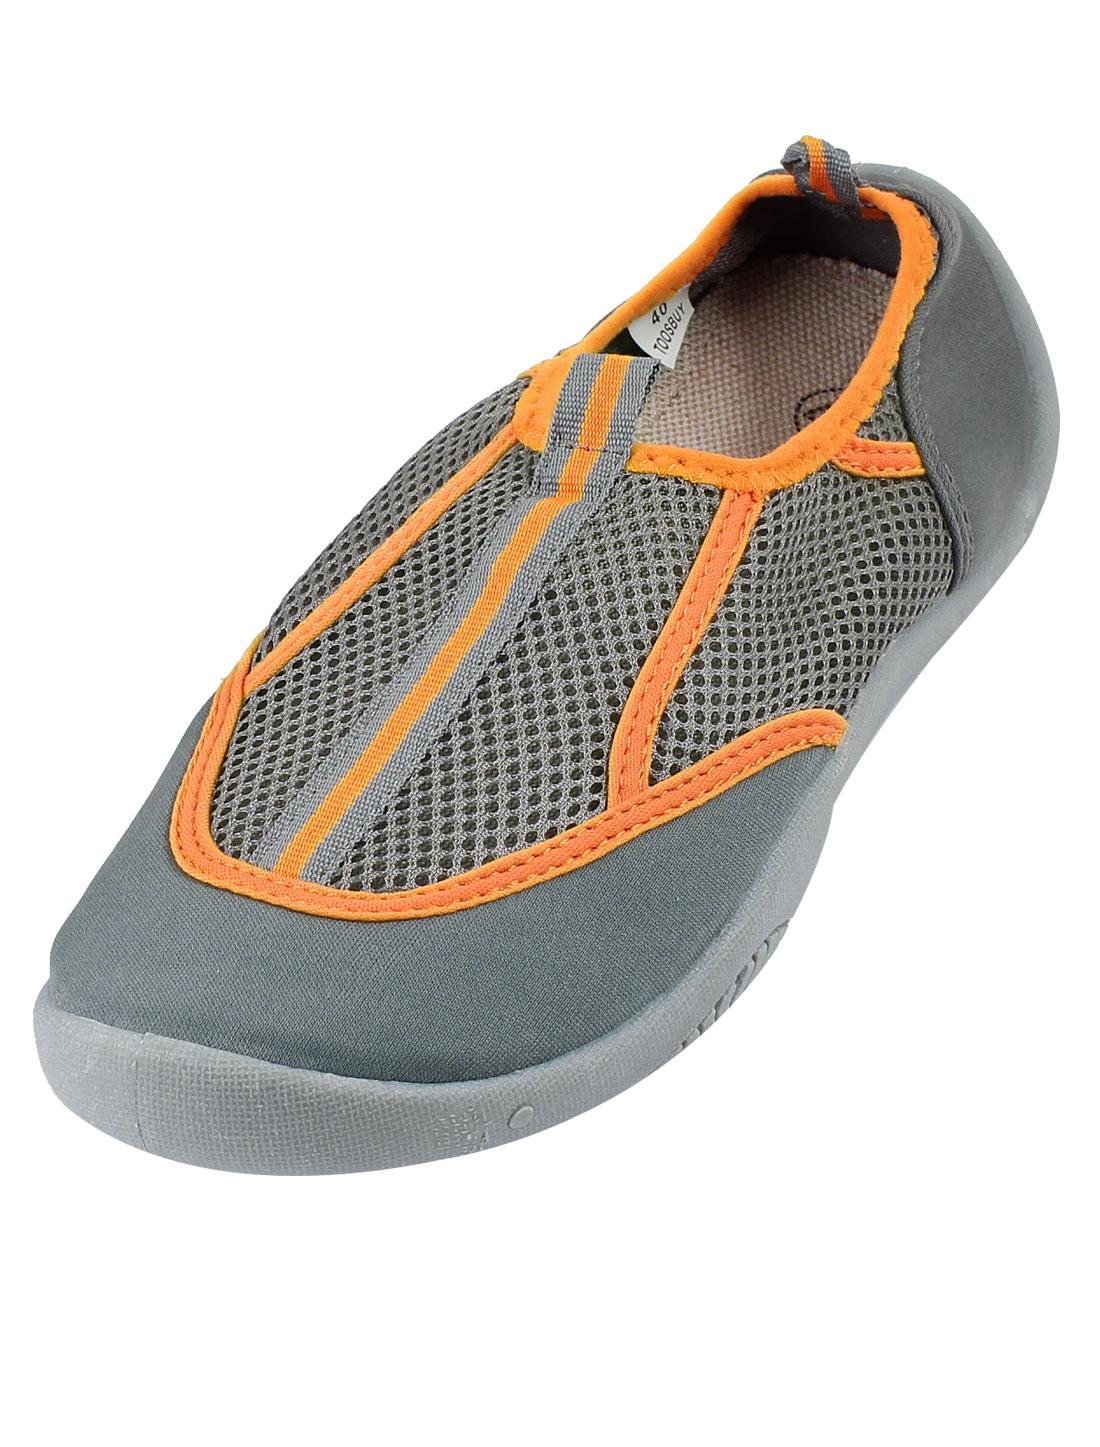 Gray Orange Round Toe Low Platform Flat Beach Mesh Shoes US 9 for Women